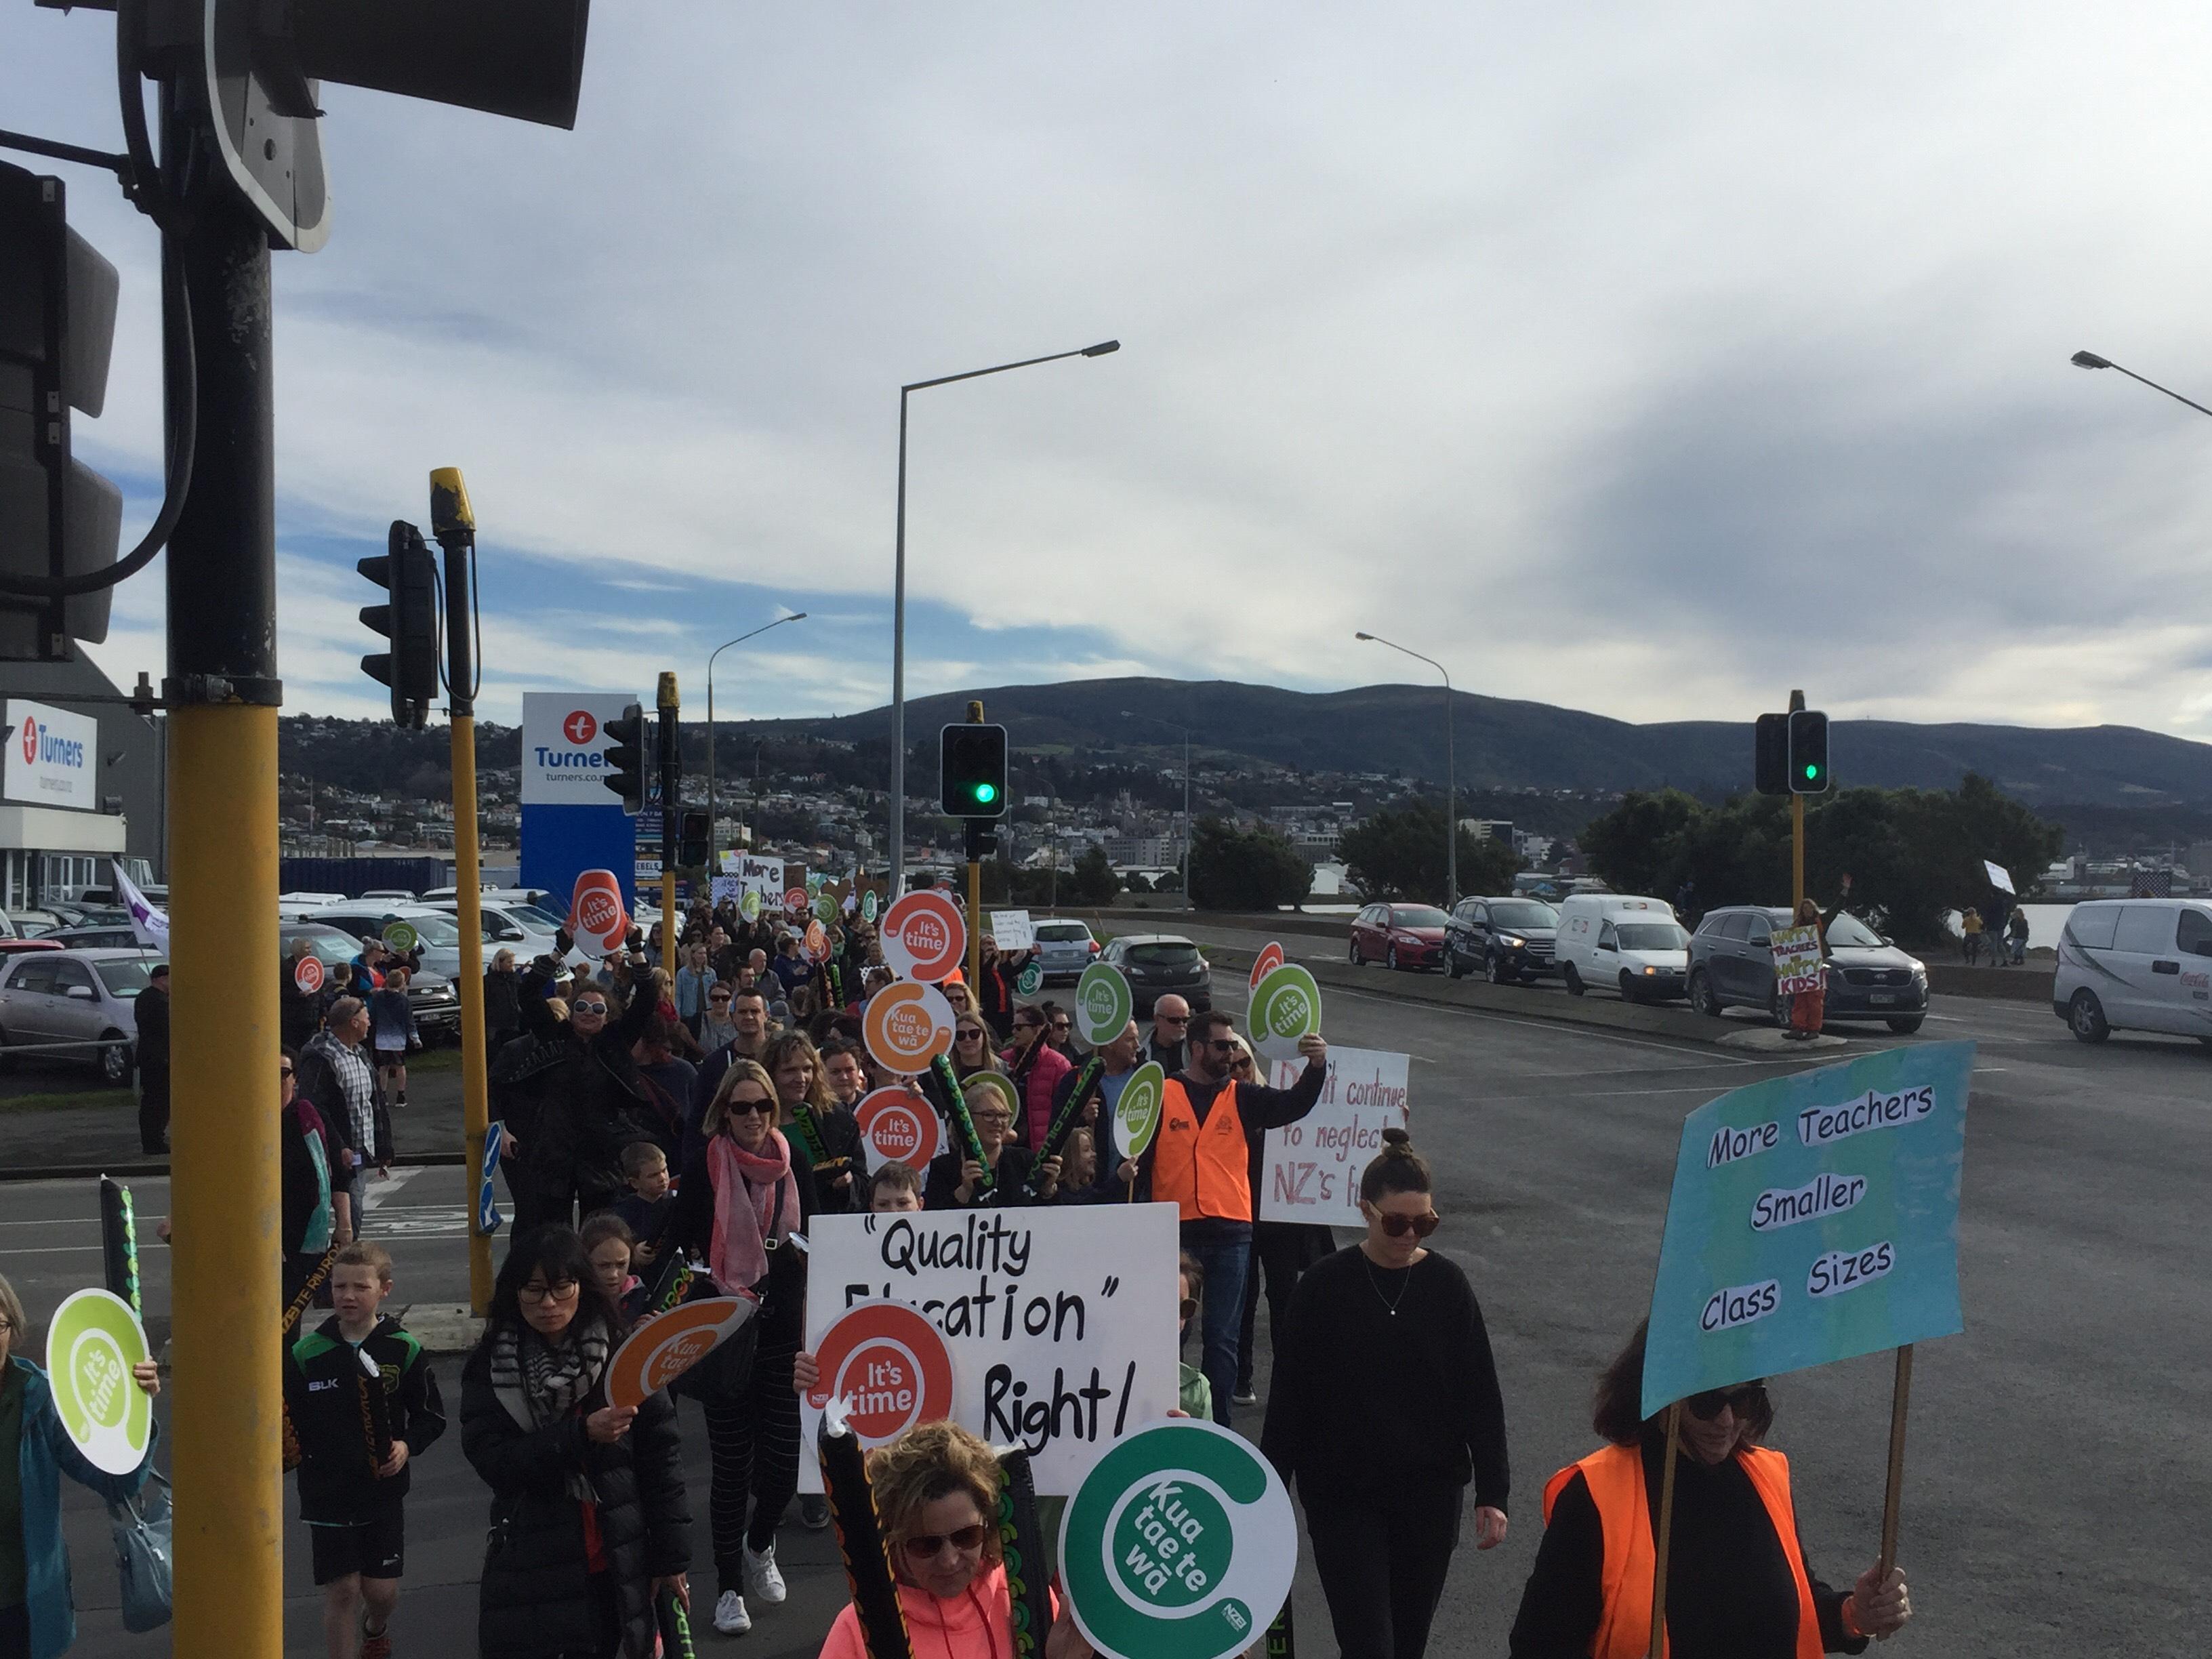 Dunedin teachers picket in Portsmouth Dr today. Photo: Tim Miller